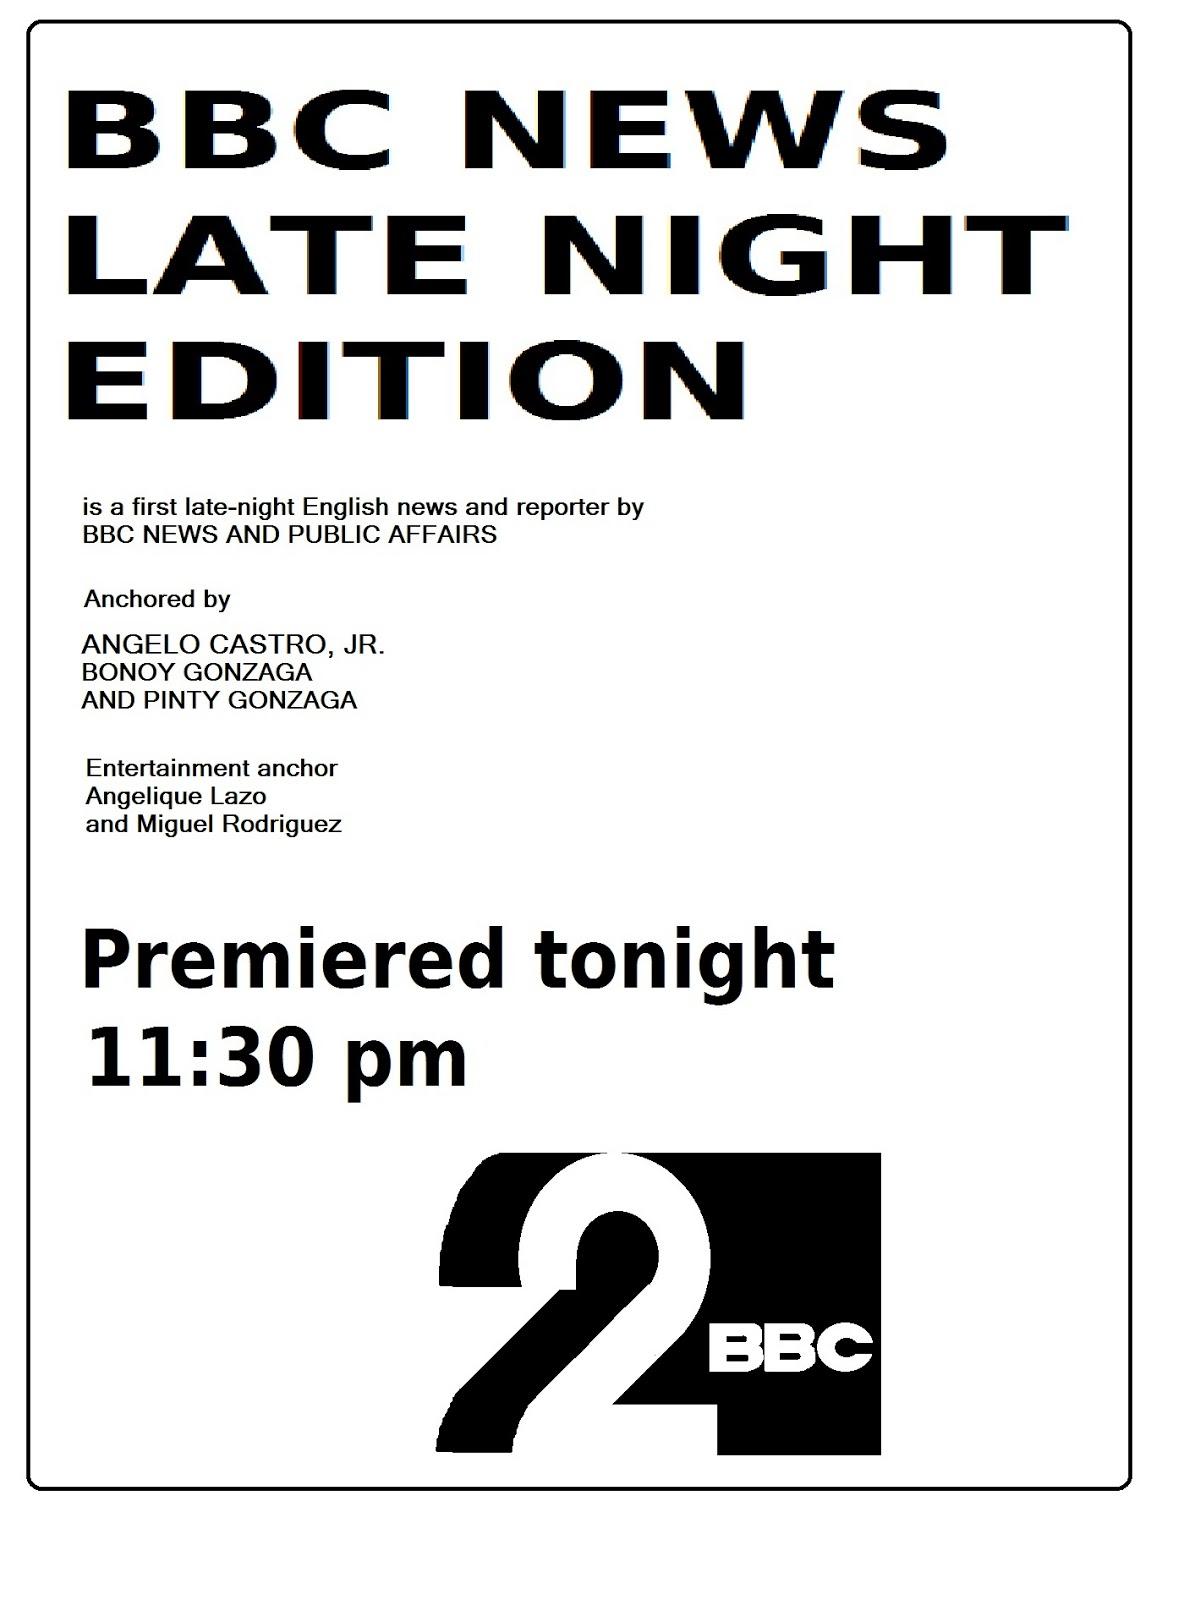 Bonoy Gonzaga: BBC News Late Night Edition on BBC Channel